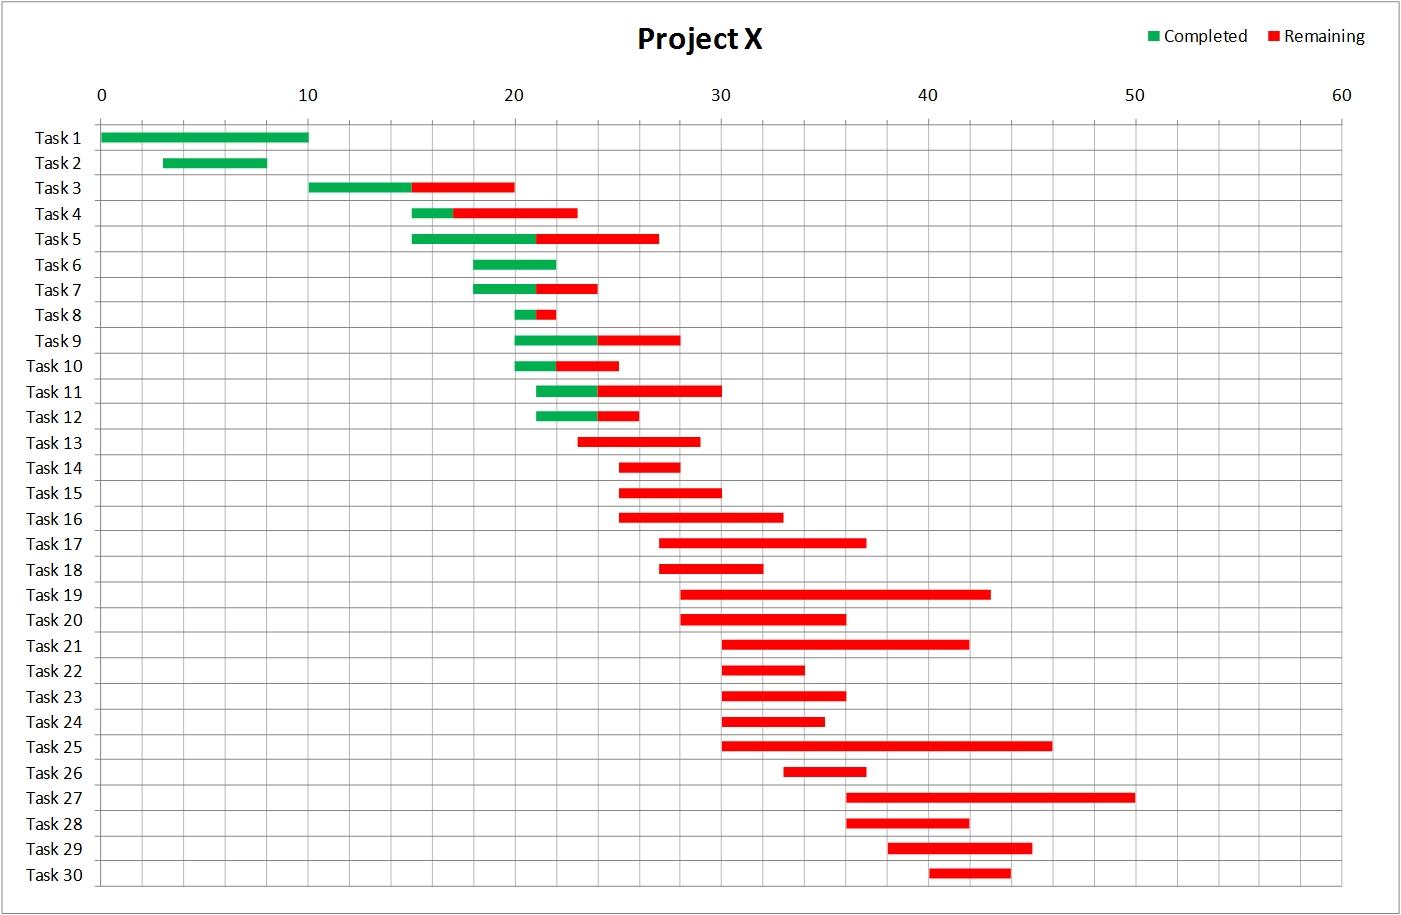 Sample Resume Xls Format Resume Template 92 Free Word Excel Pdf Psd Format Gantt Chart Template Excel Resume Builder Resume Templates